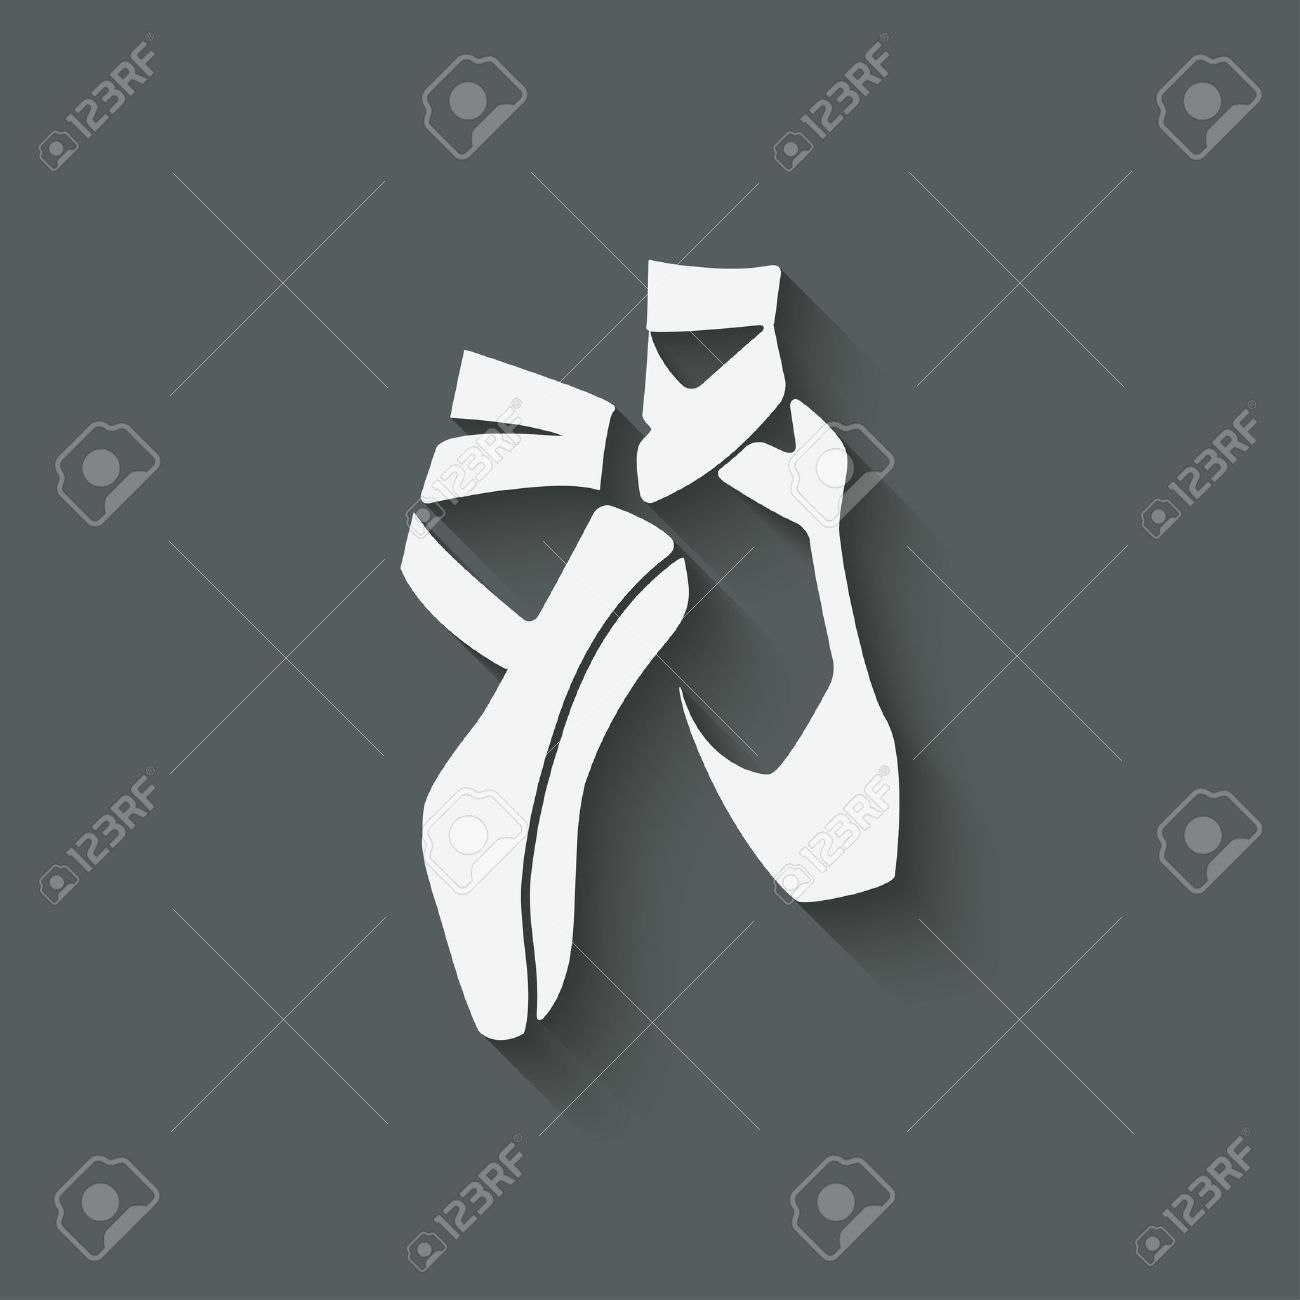 ballet dance studio symbol - vector illustration. eps 10 - 34737857